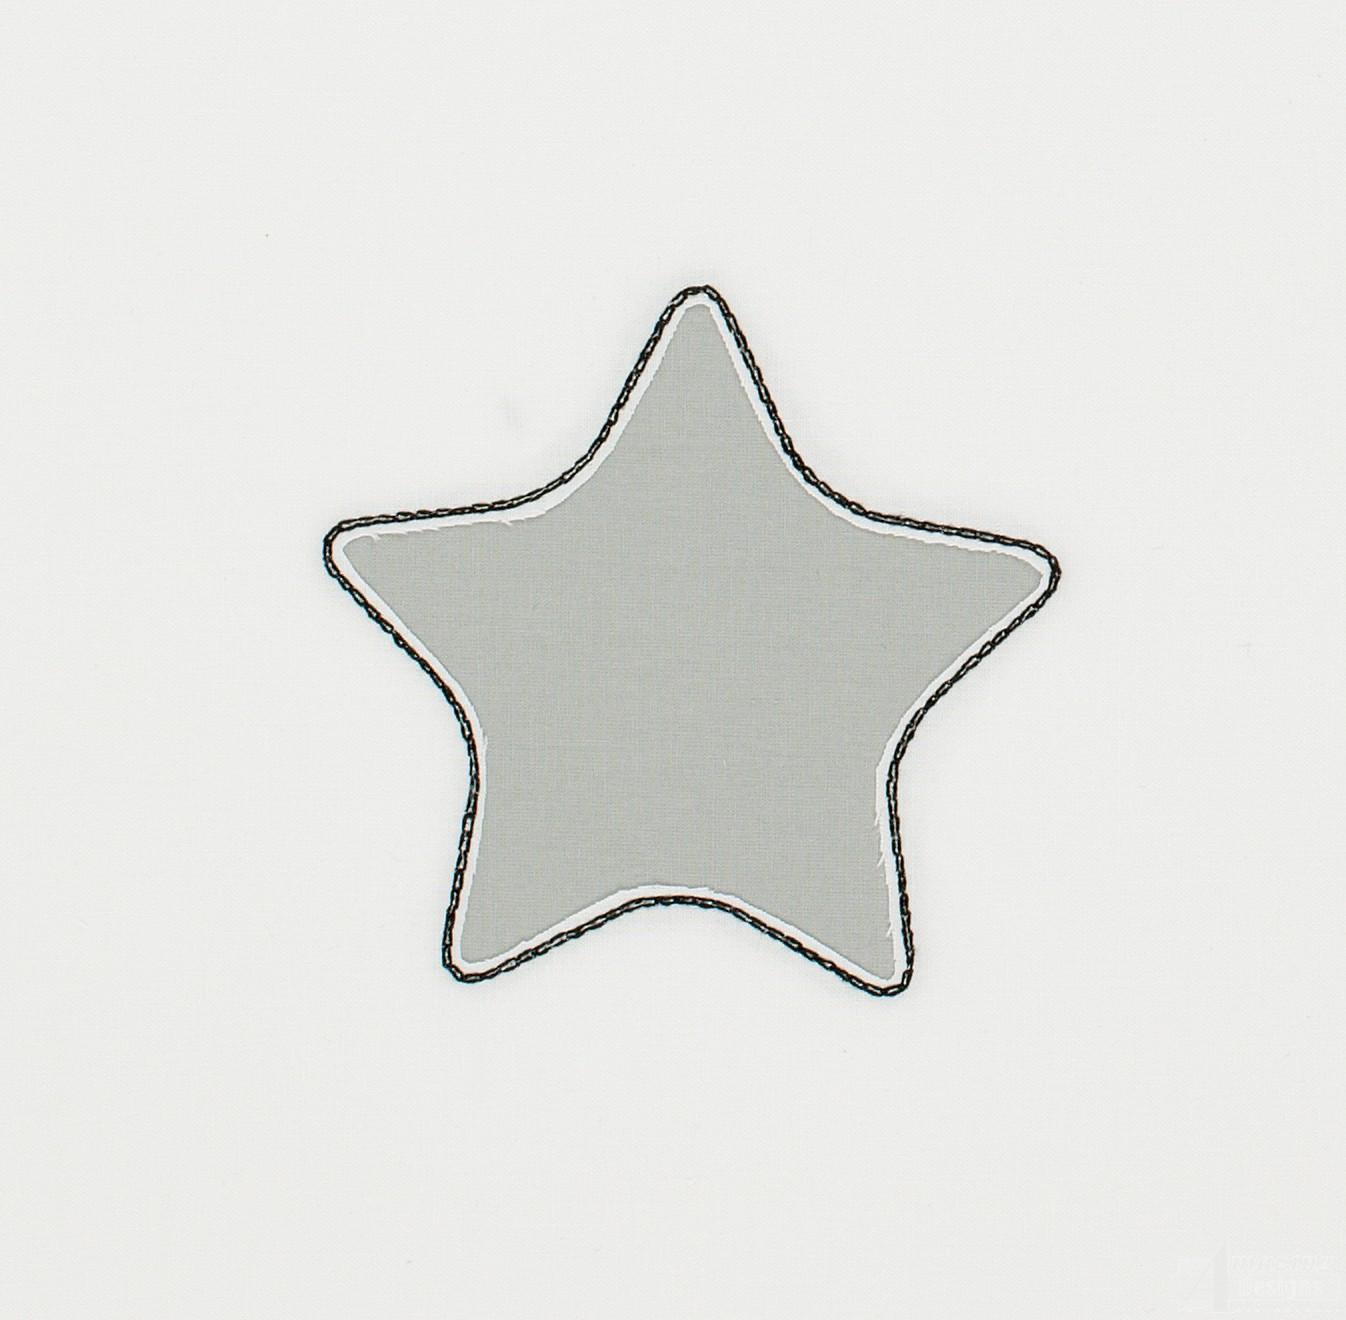 Star reverse applique embroidery design